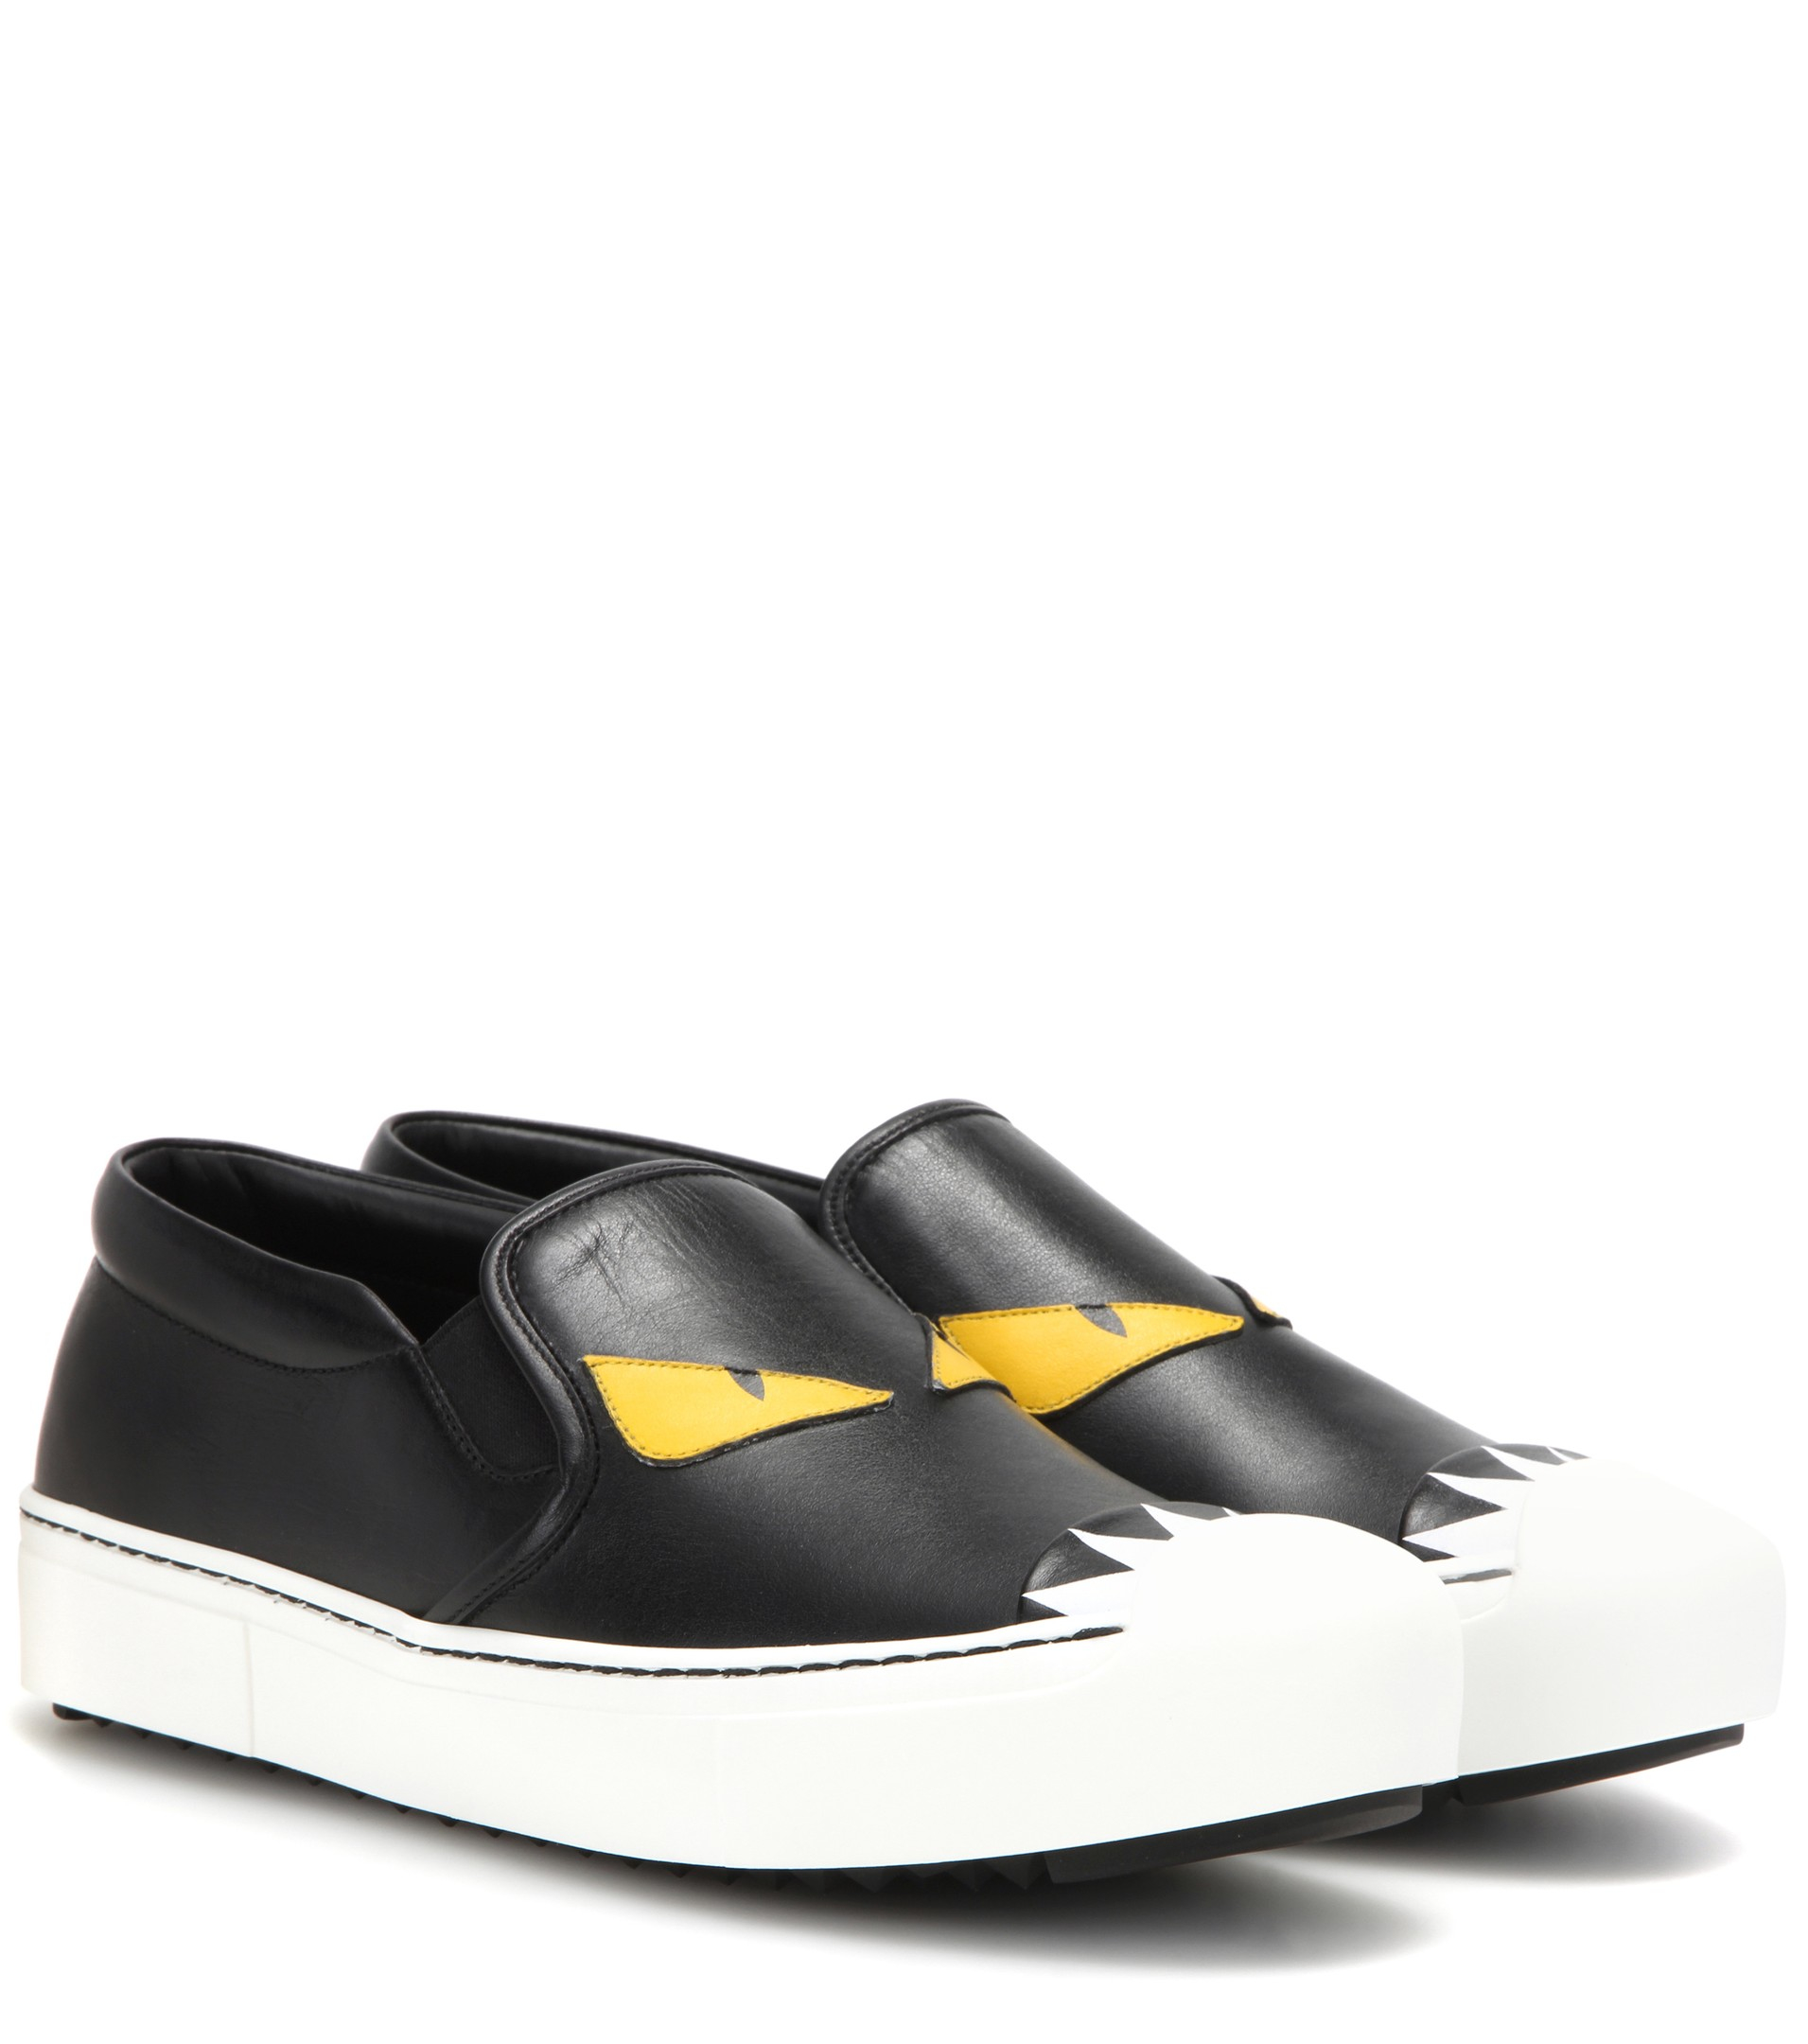 Fendi Womens Shoes Price